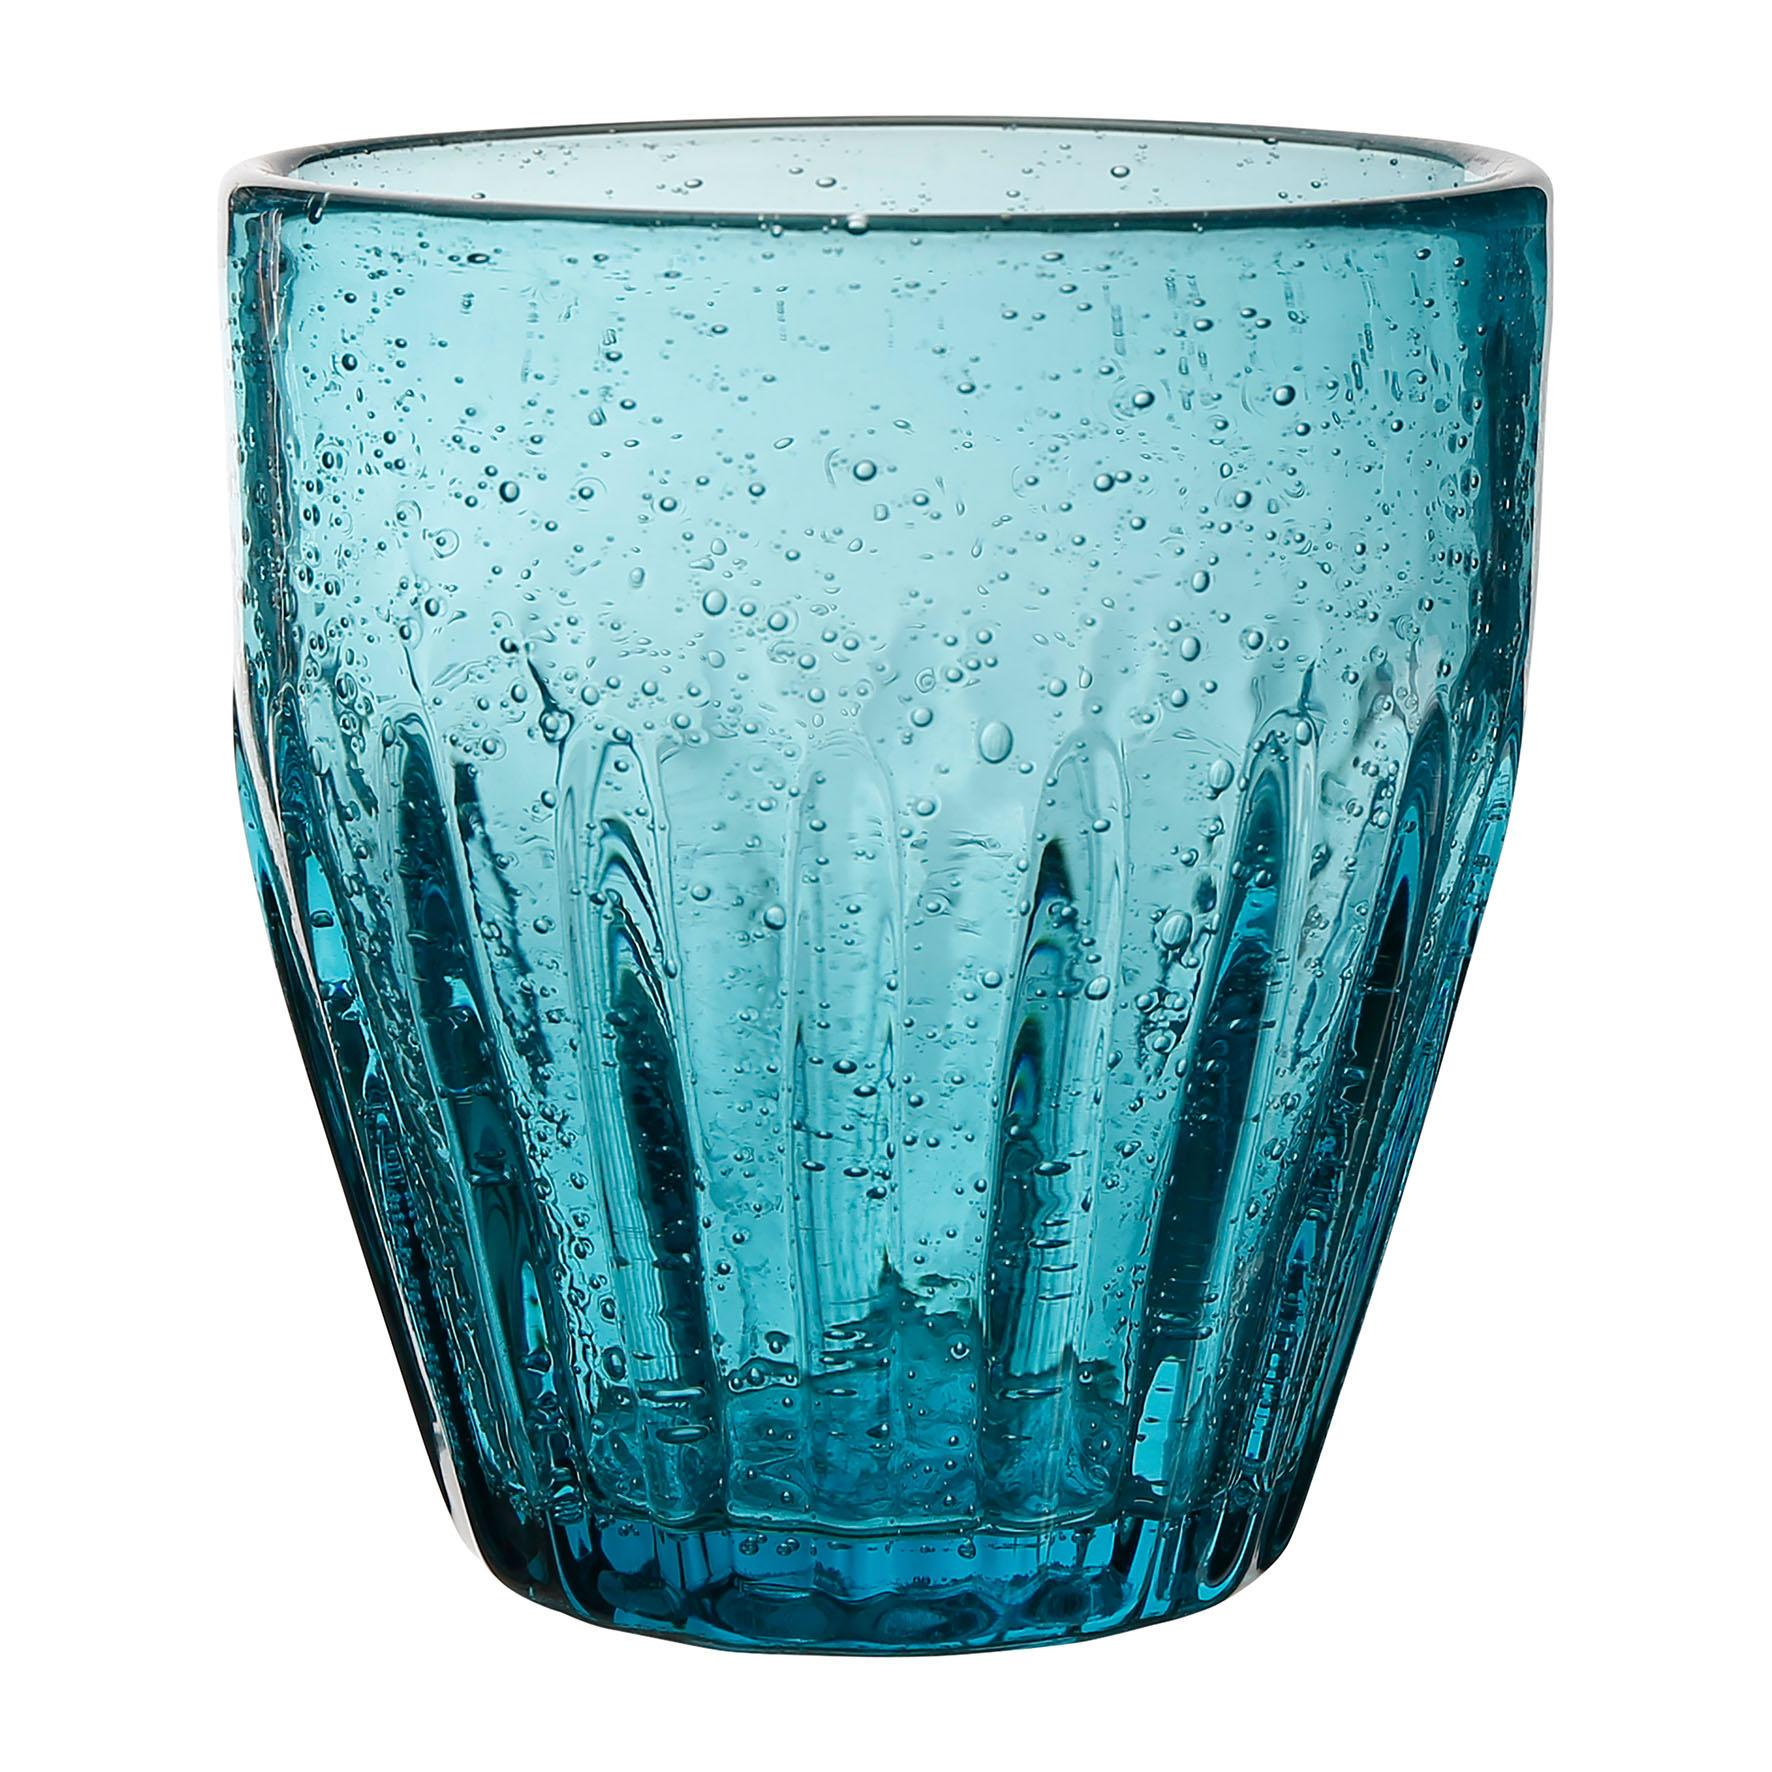 CÔTÉ TABLE Sklenice - Pernille Bleu, modrá barva, čirá barva, sklo